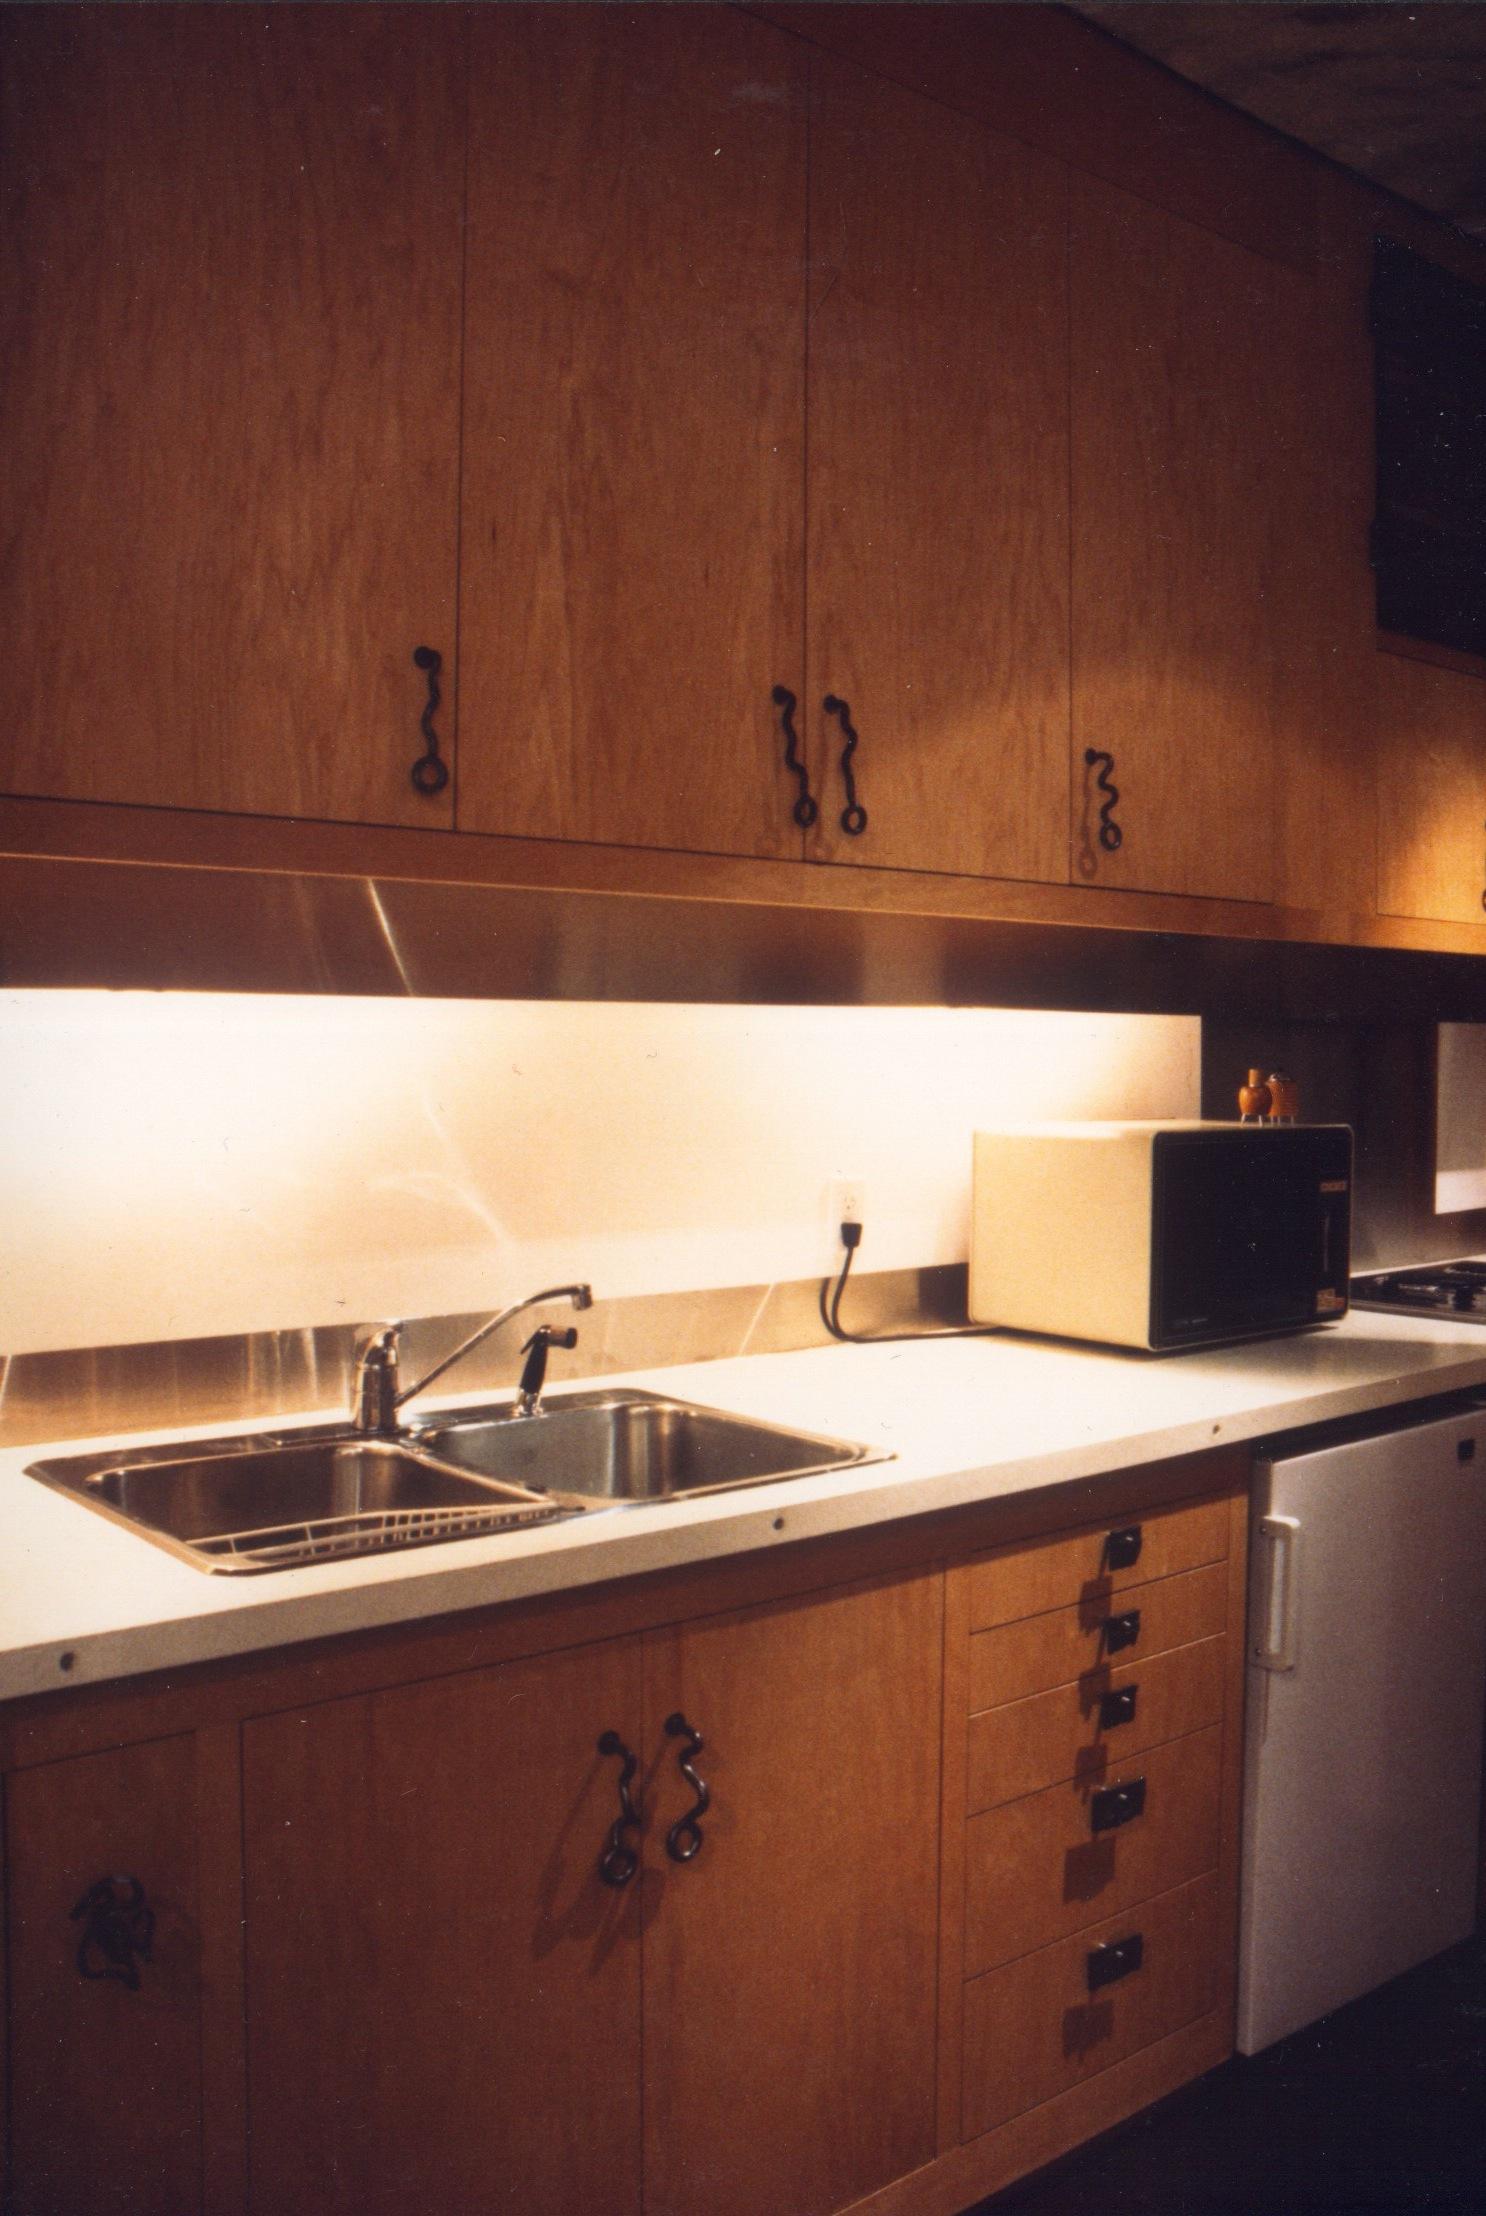 Kitchen - Hidden Valence / Handmade Hardware